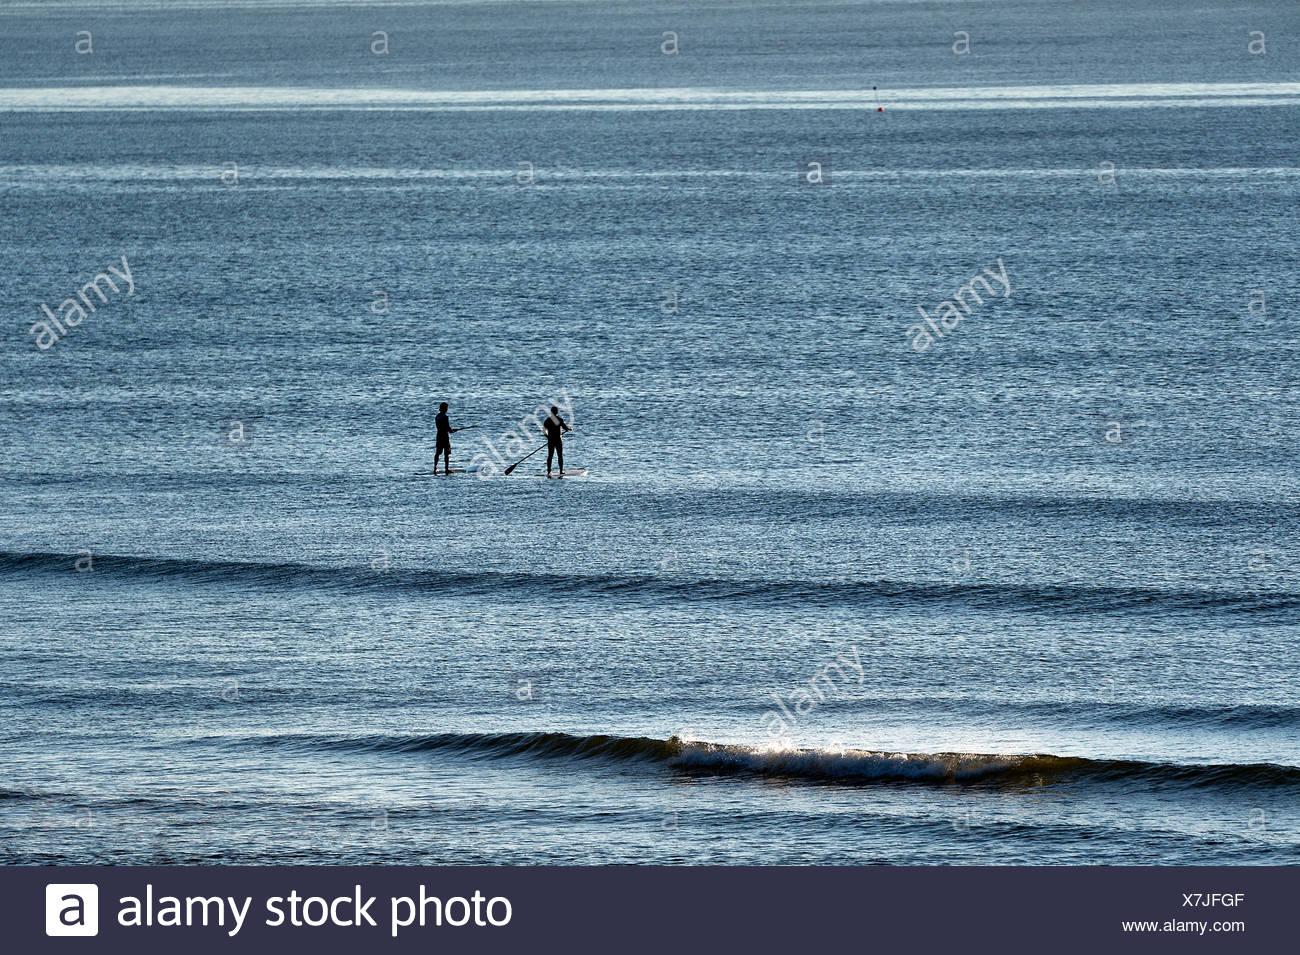 Surfers Paddle board en tête d'attraper une vague, Coast Guard Beach, Cape Cod, Massachusetts, USA Photo Stock